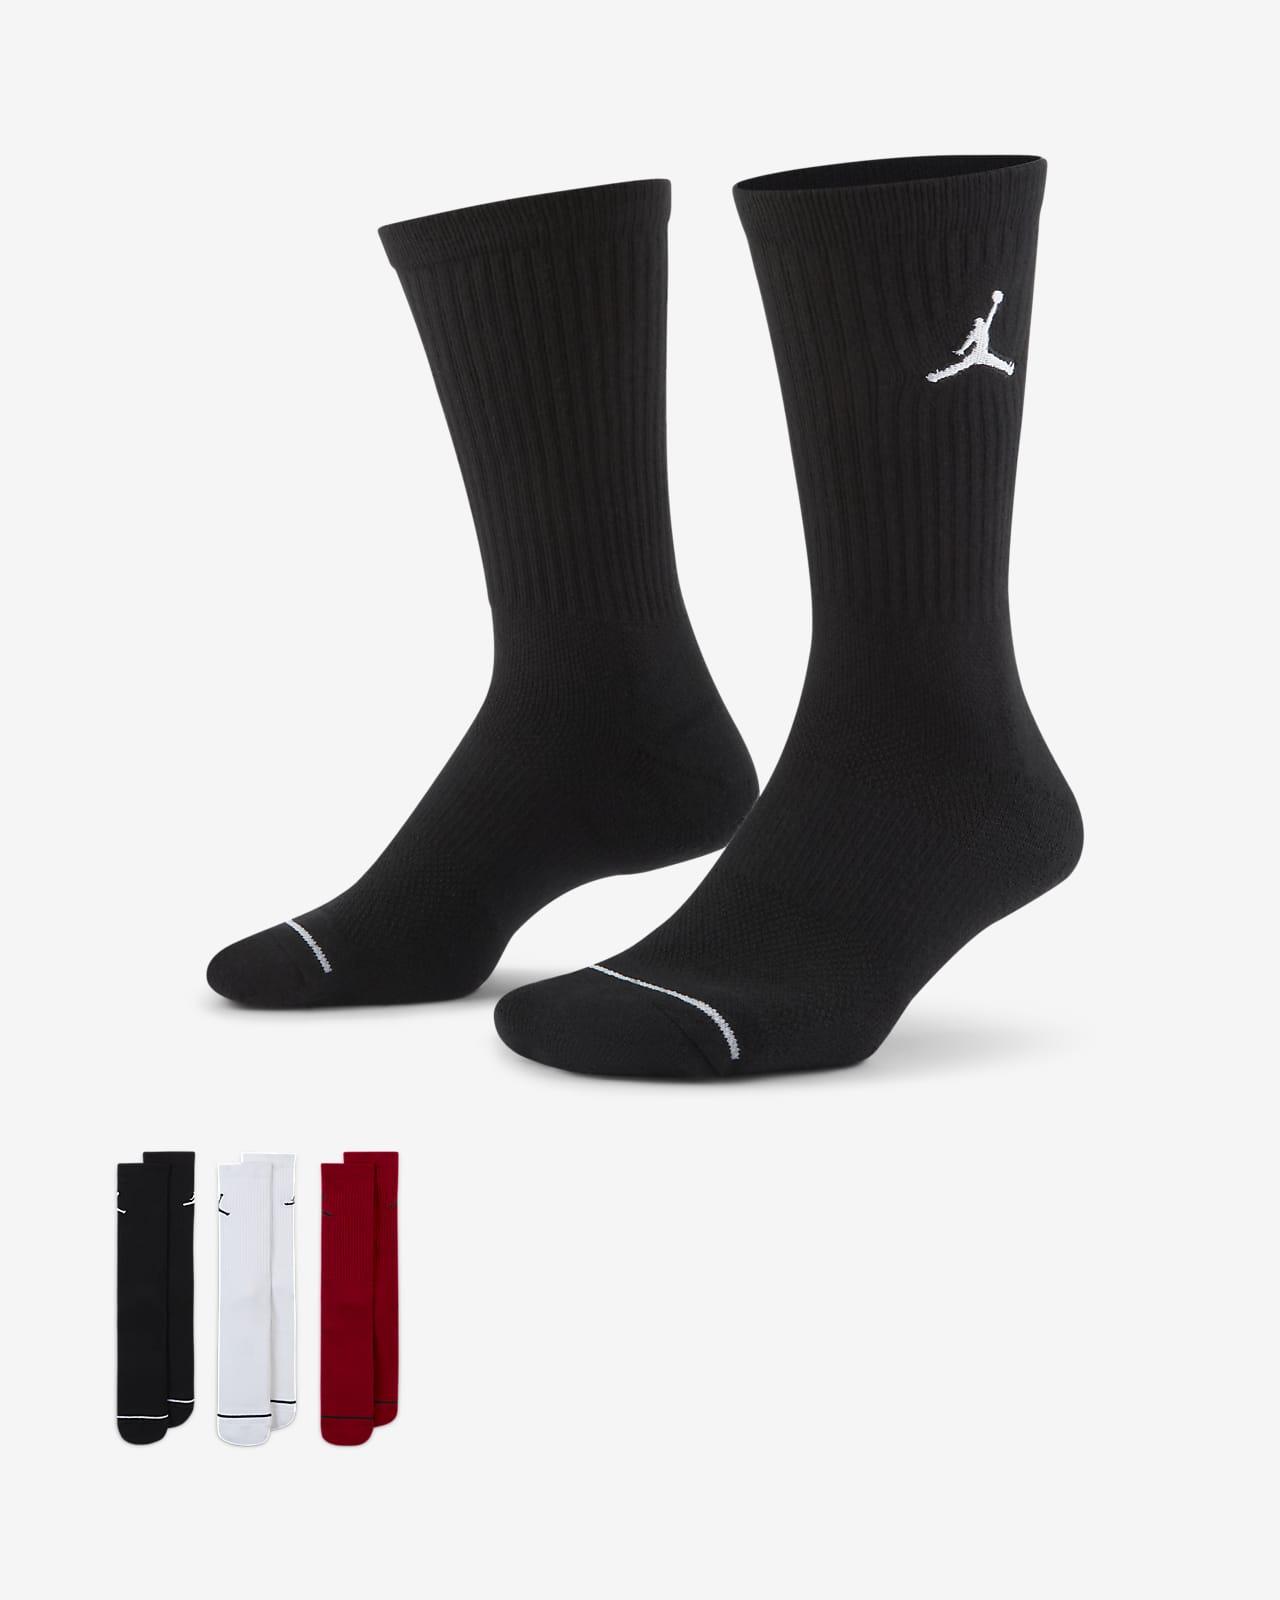 Chaussettes mi-mollet mixtes Jordan Everyday Max (3 paires)